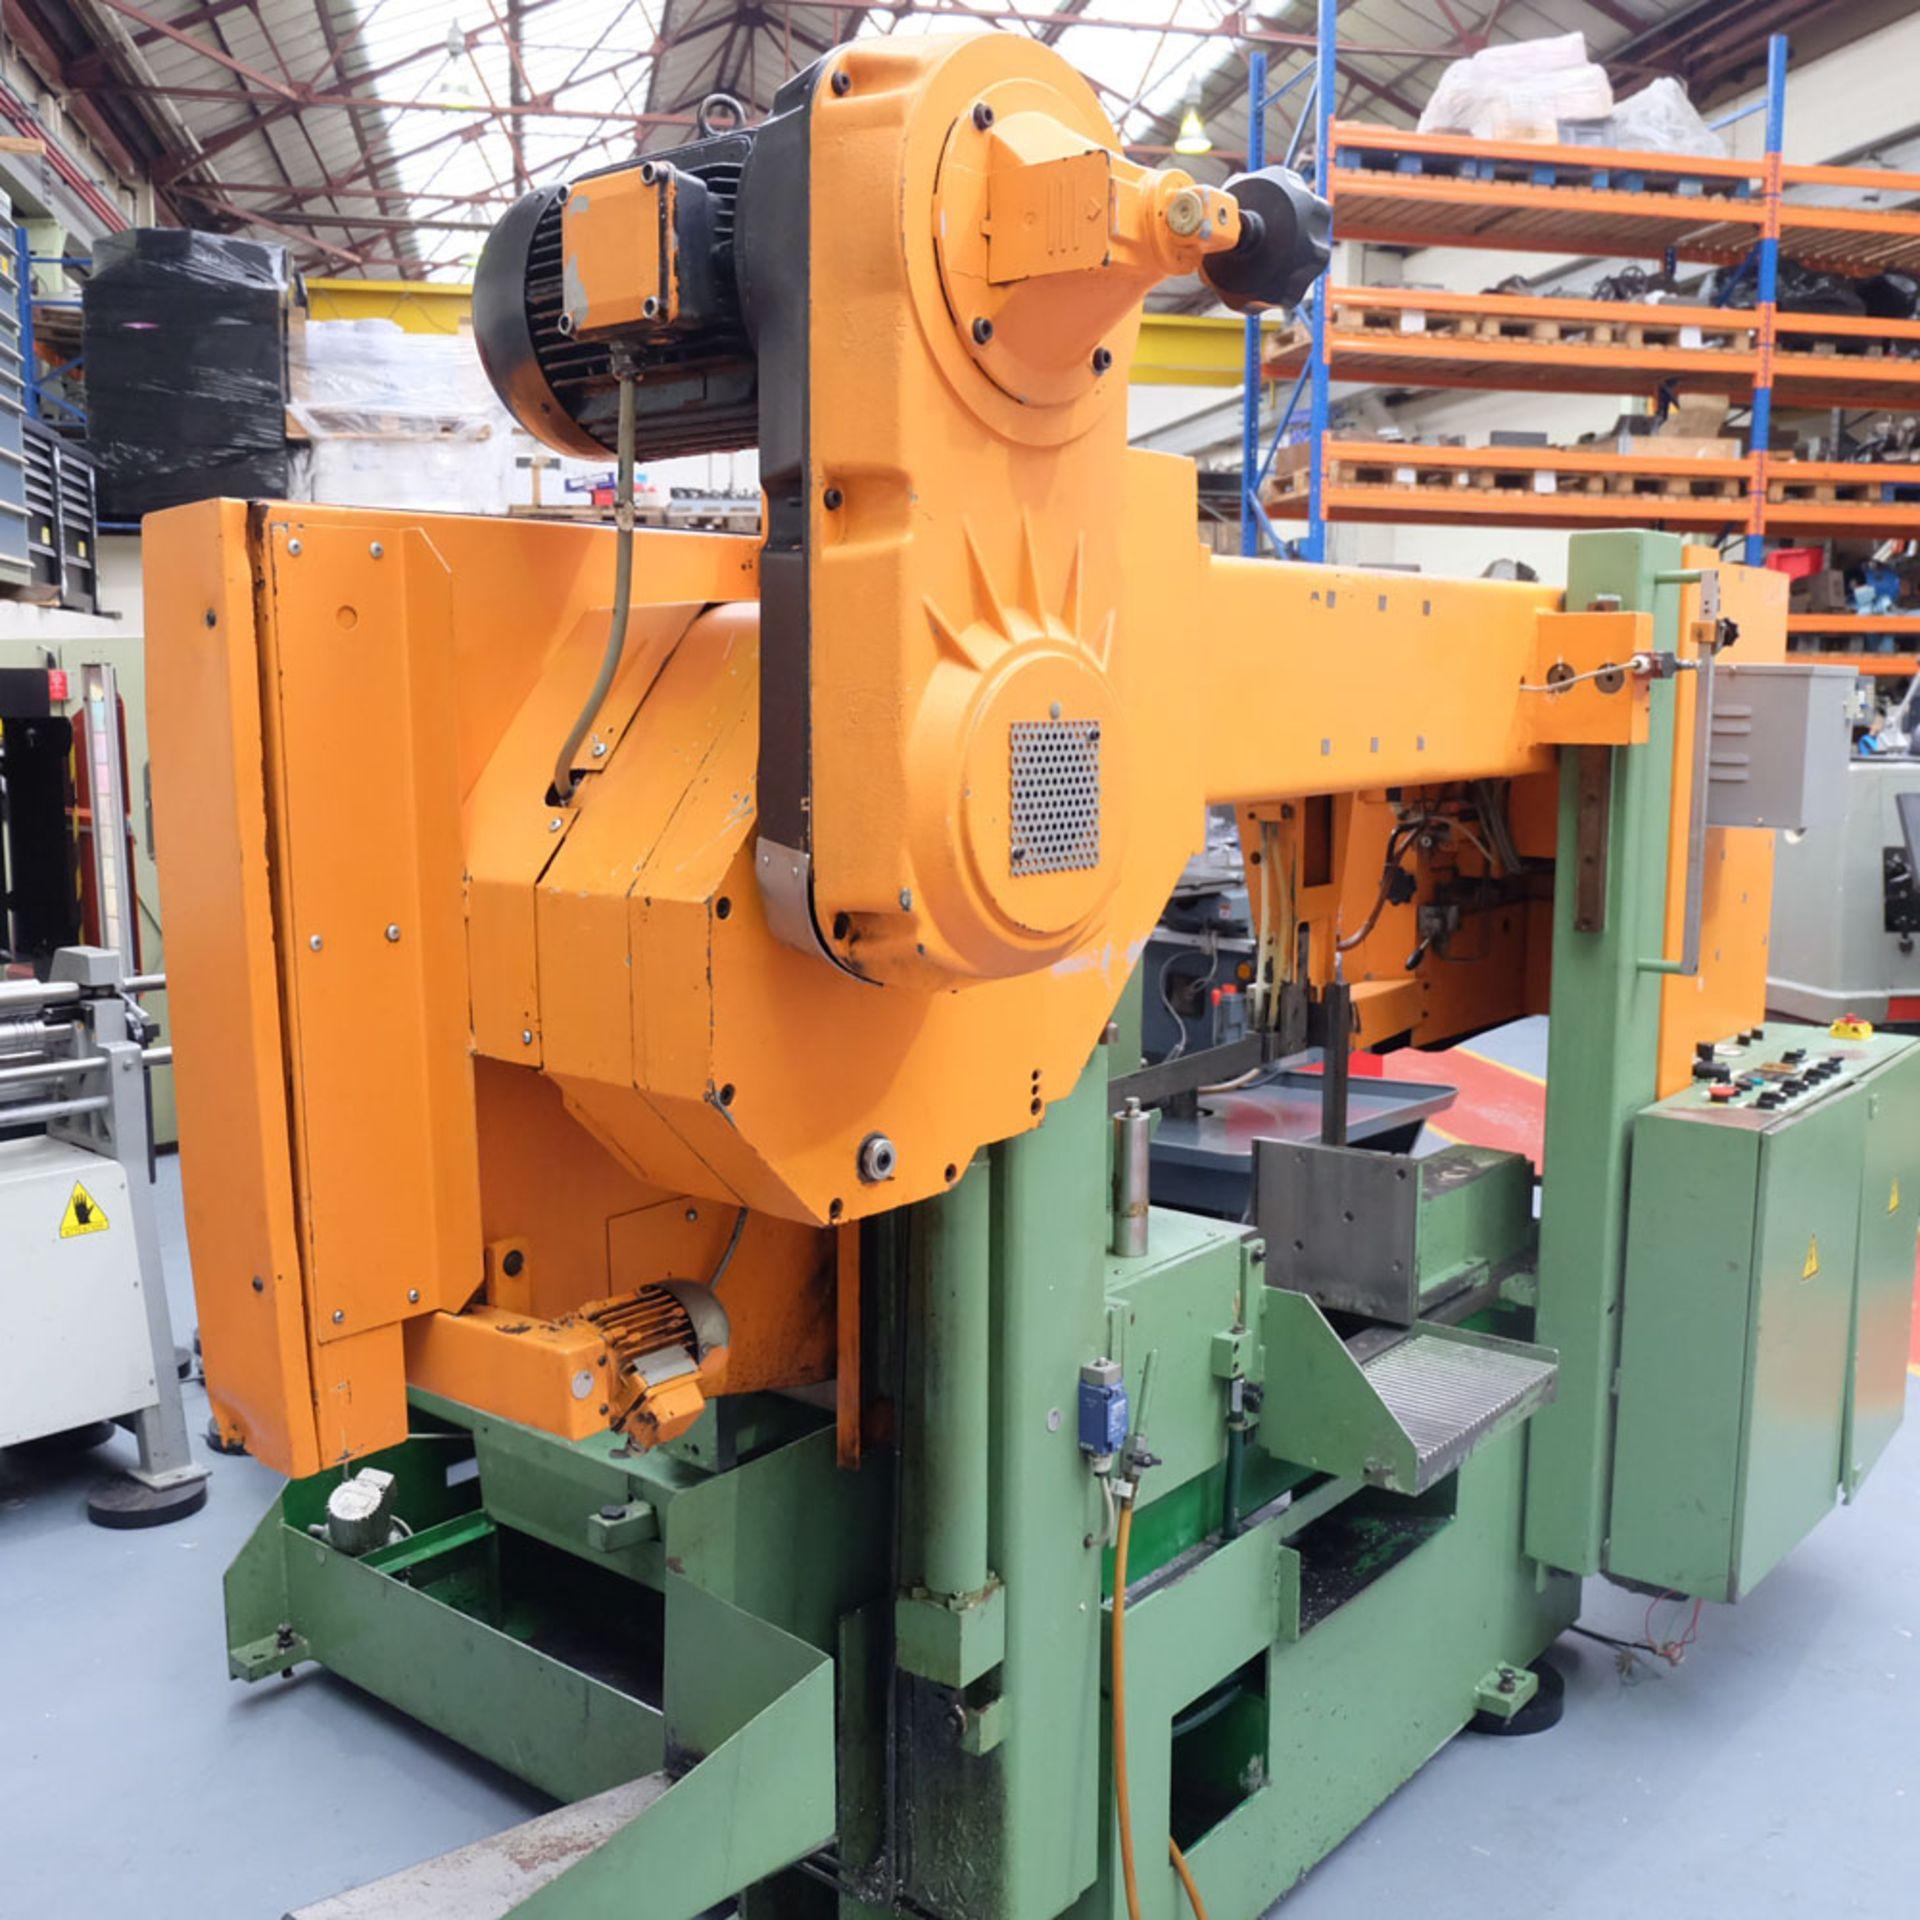 Kasto HBA 420 AU Heavy Duty Automatic Horizontal Band Sawing Machine. - Image 4 of 7